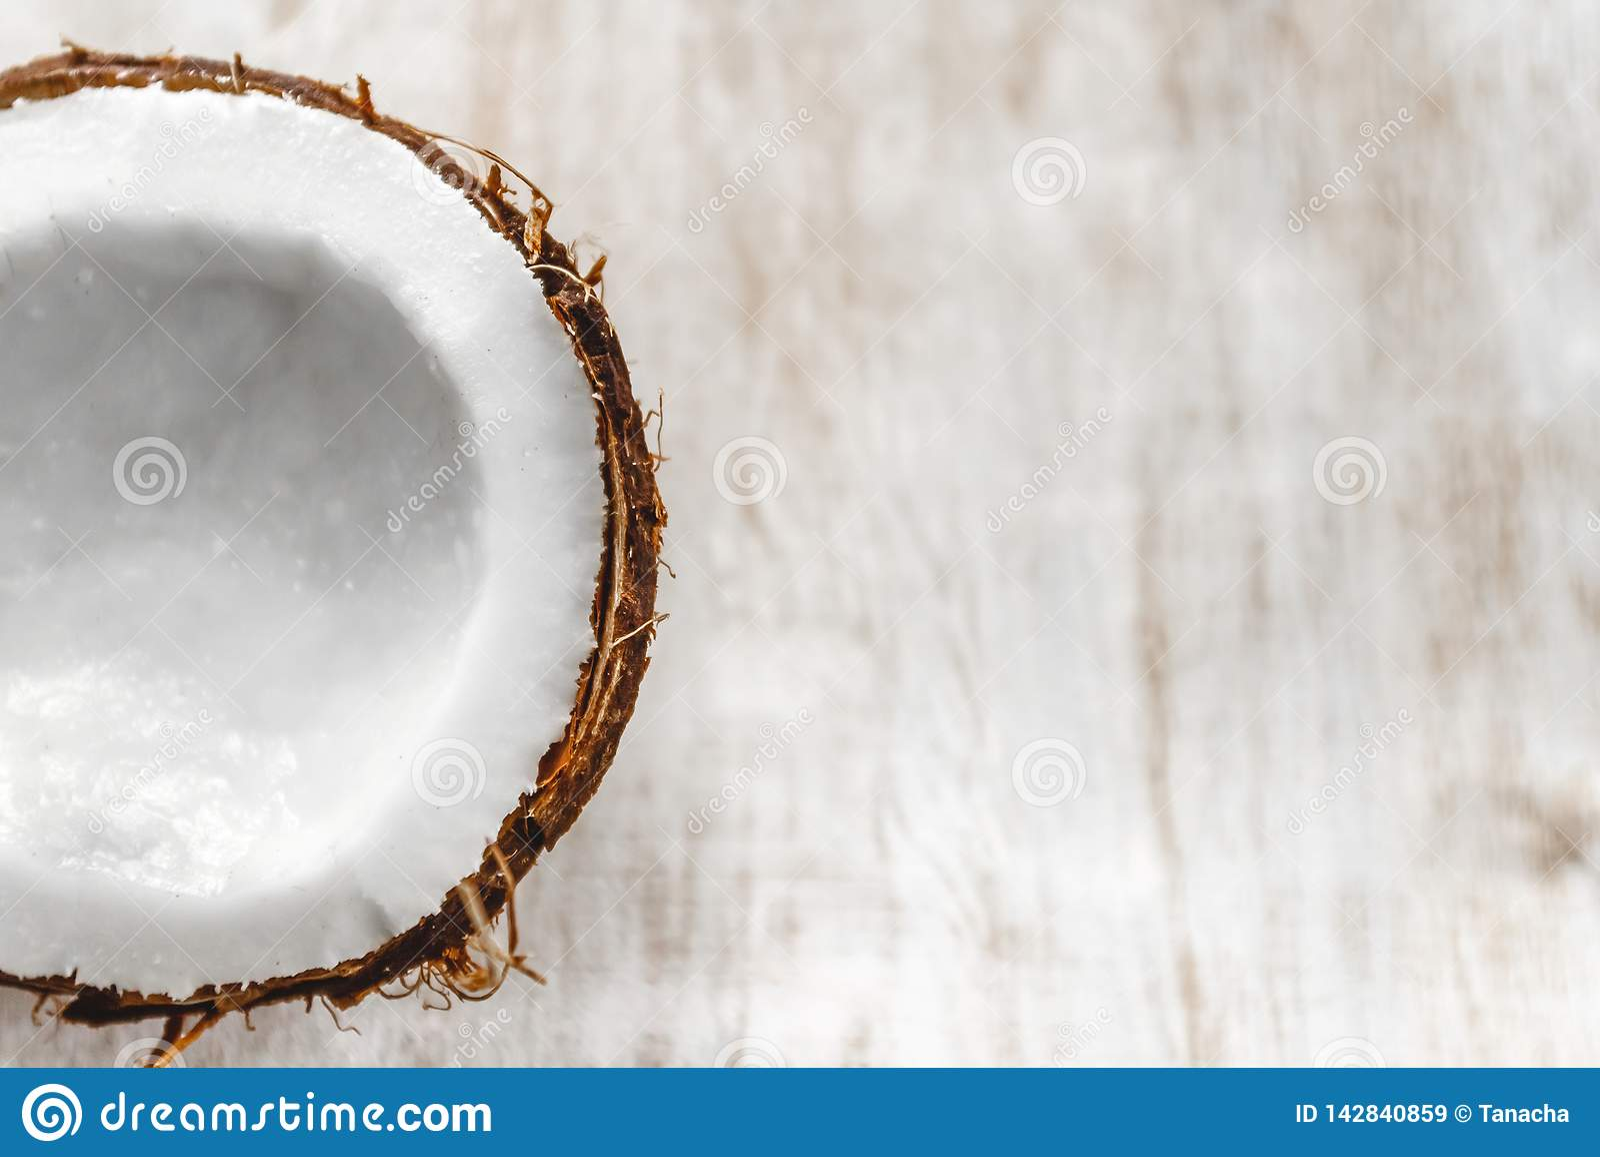 Halv kokosn?t p? en ljus vit tr?bakgrund, closeup Top besk?dar